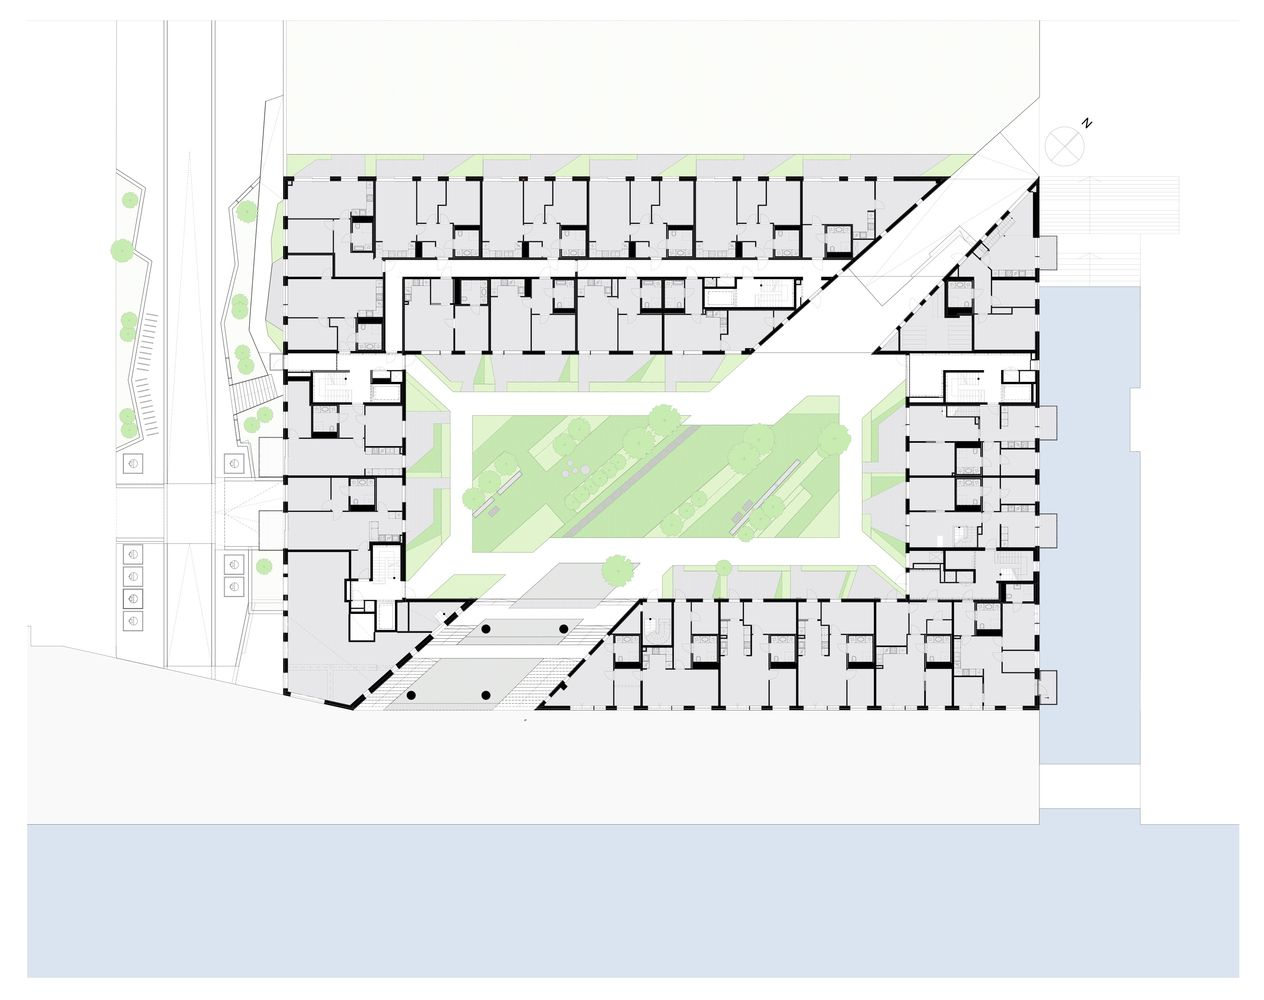 Sorenga Block 6 Floor Plan City Layout Floor Plans Office Building Architecture